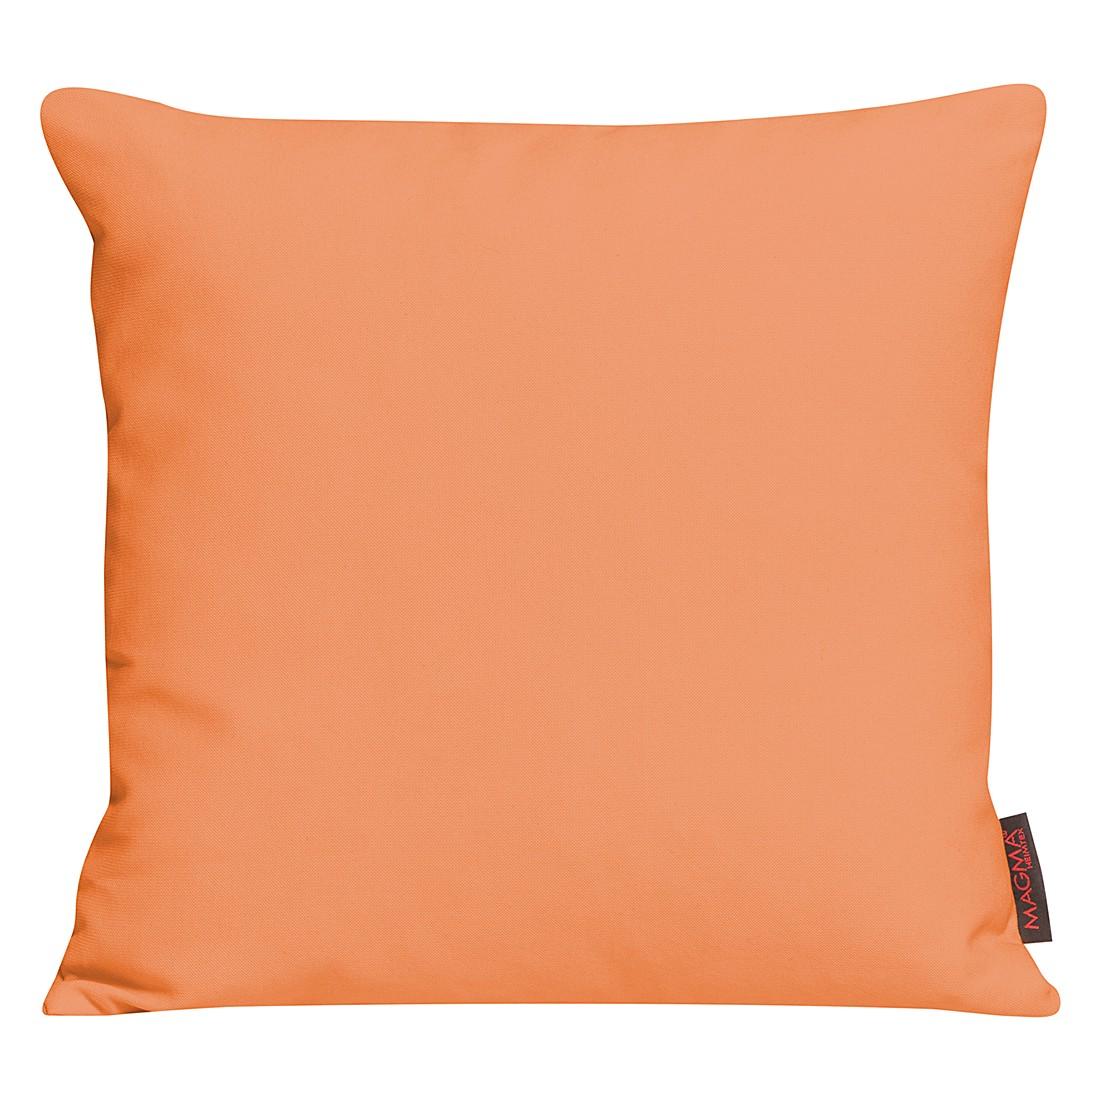 Kussenhoes Paso - oranje - 50x50cm, twentyfour